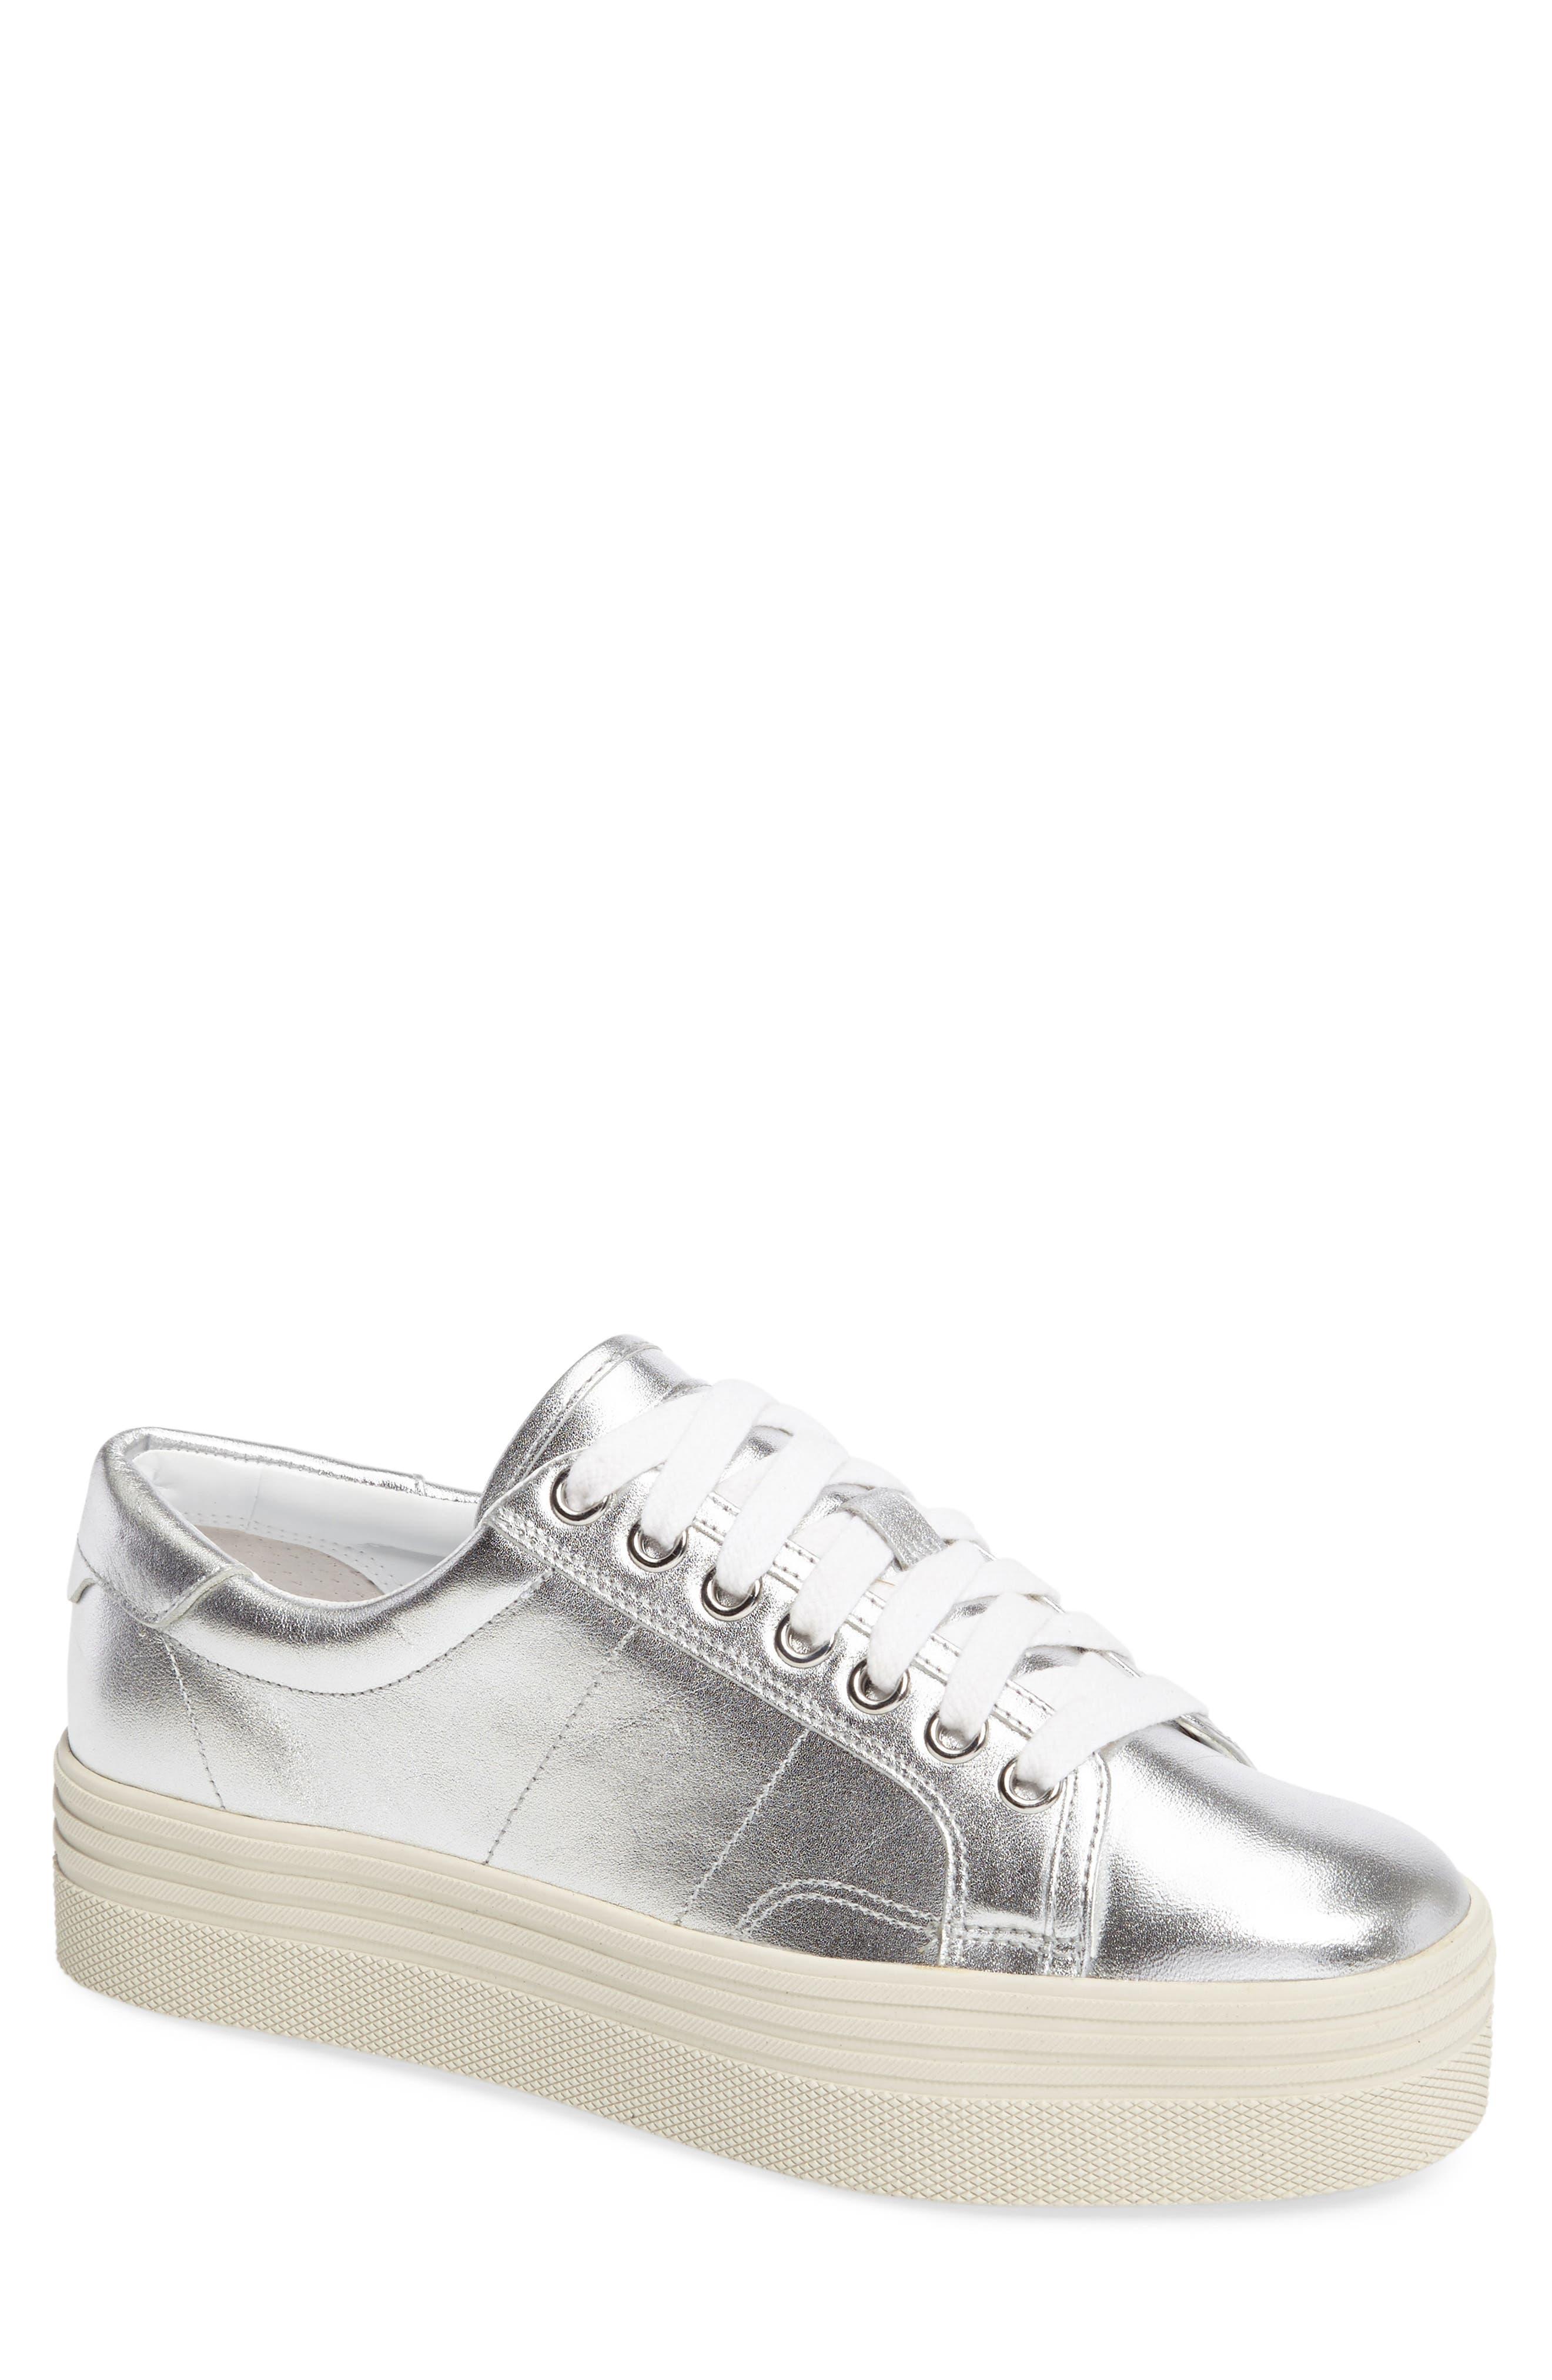 Alternate Image 1 Selected - Marc Fisher LTD Emmy Platform Sneaker (Women)